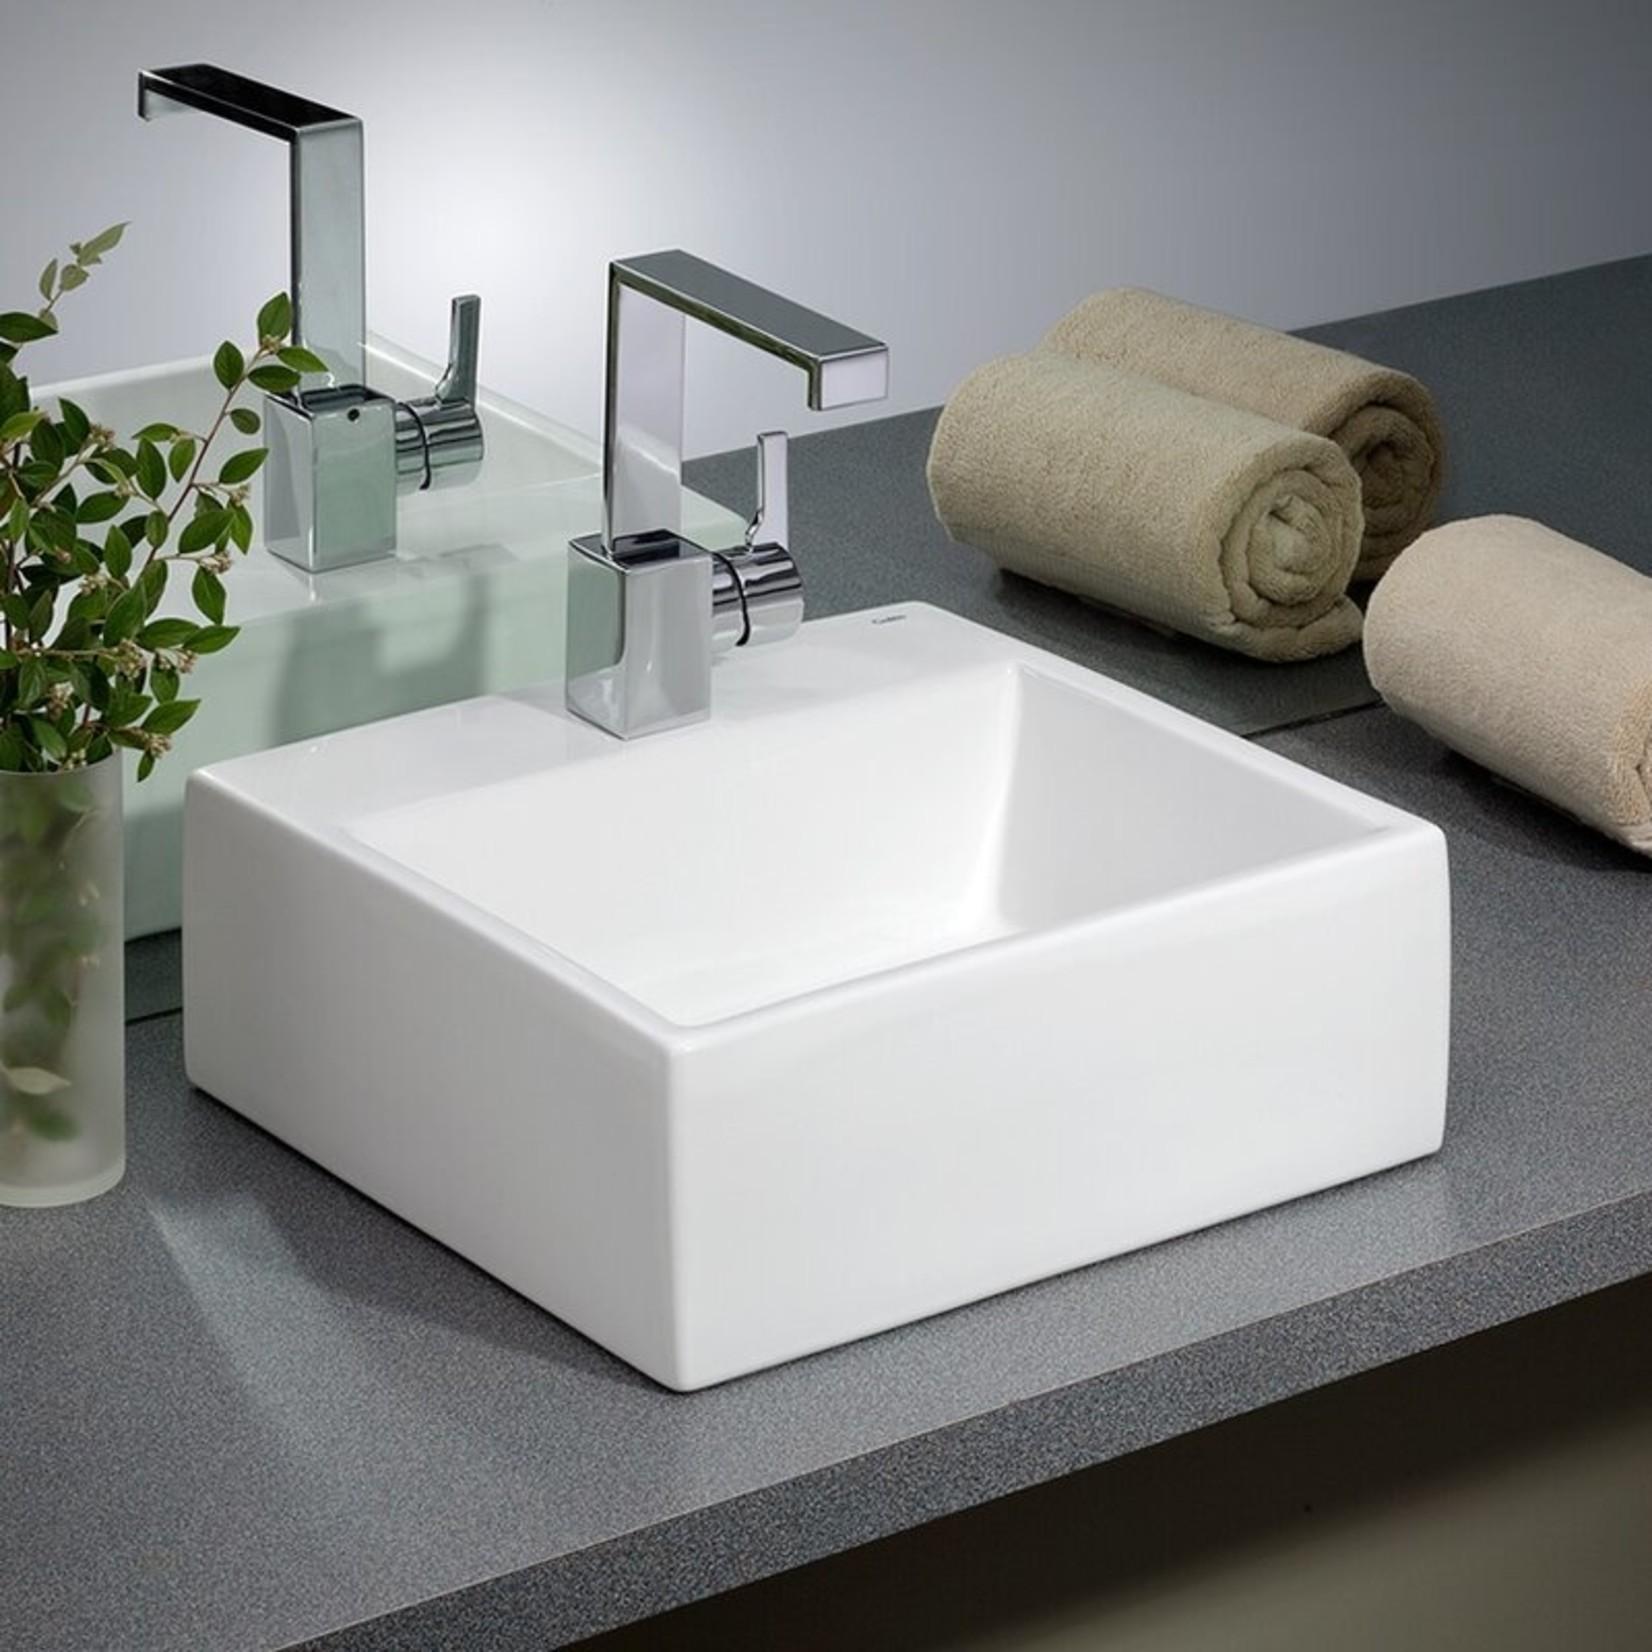 *Rio Vitreous China Rectangular Vessel Bathroom Sink